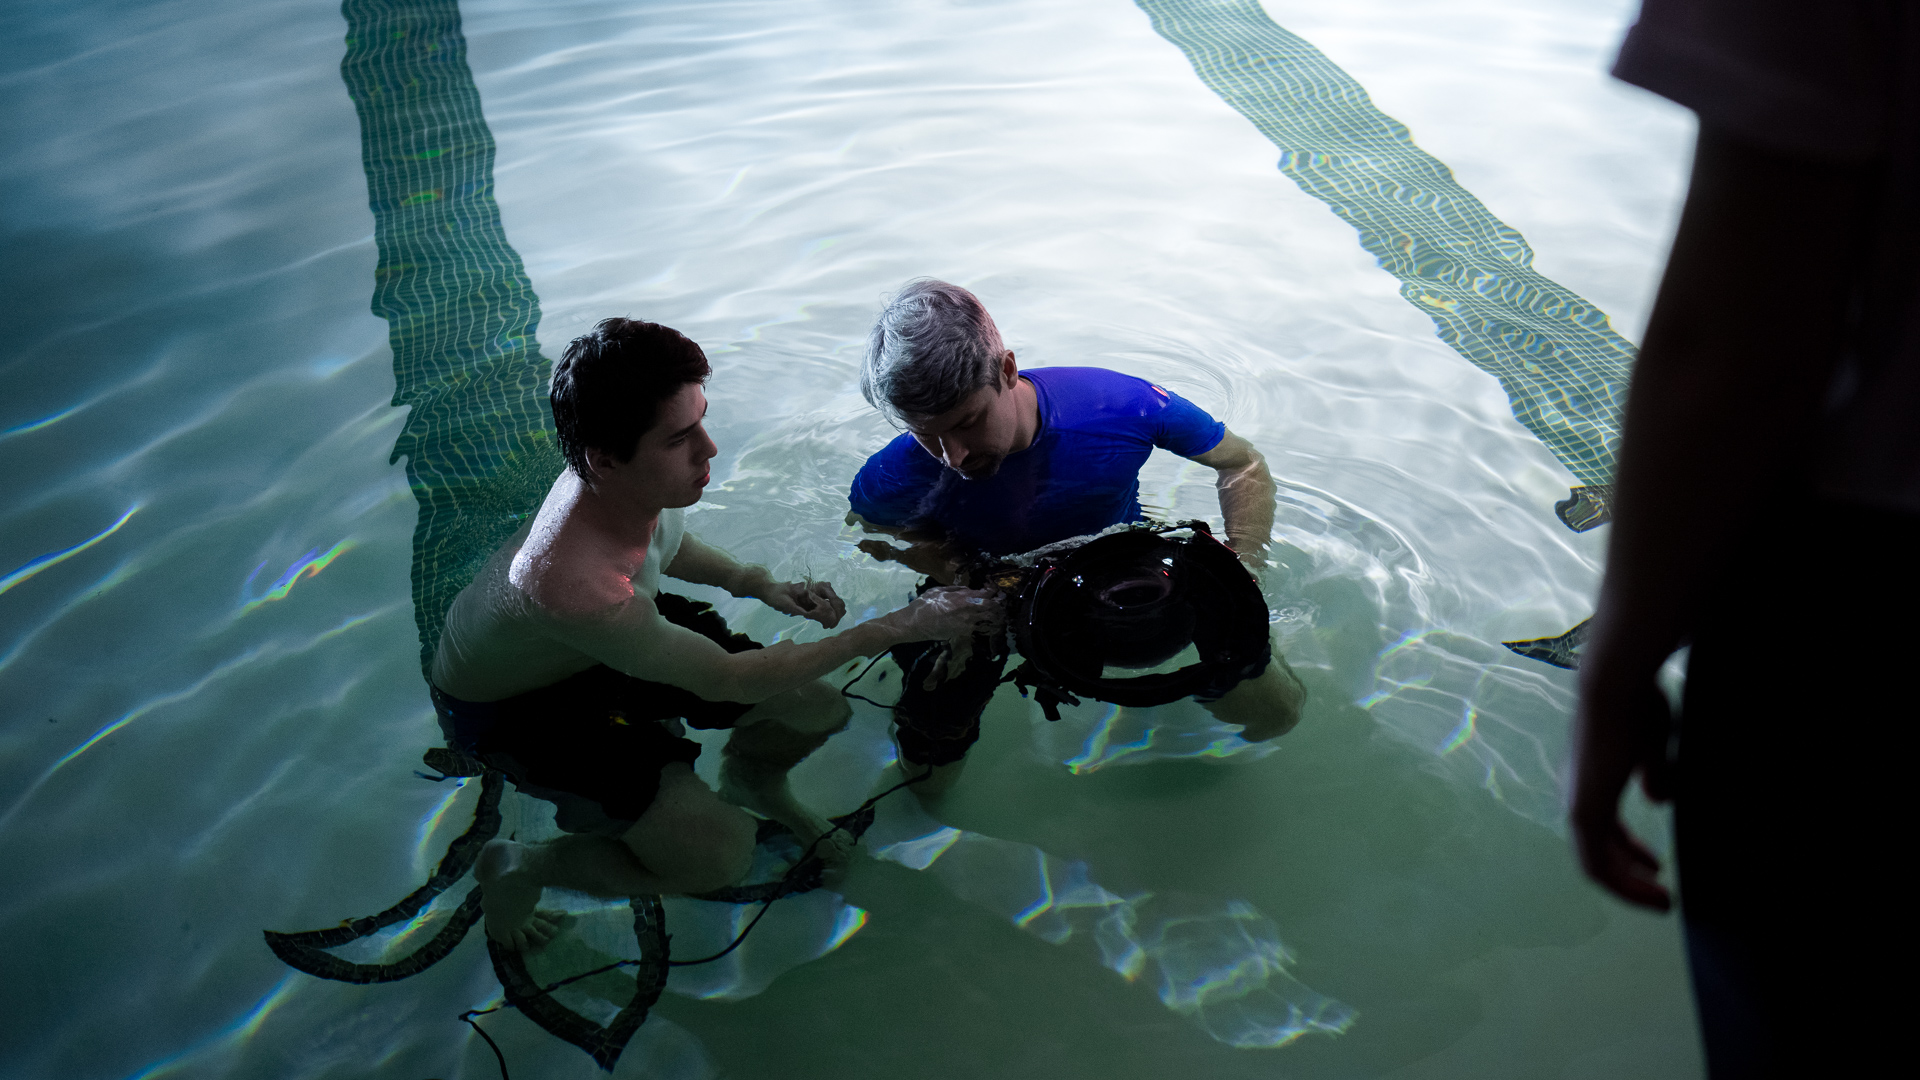 Úvahy o podvodnej kinematografii 1